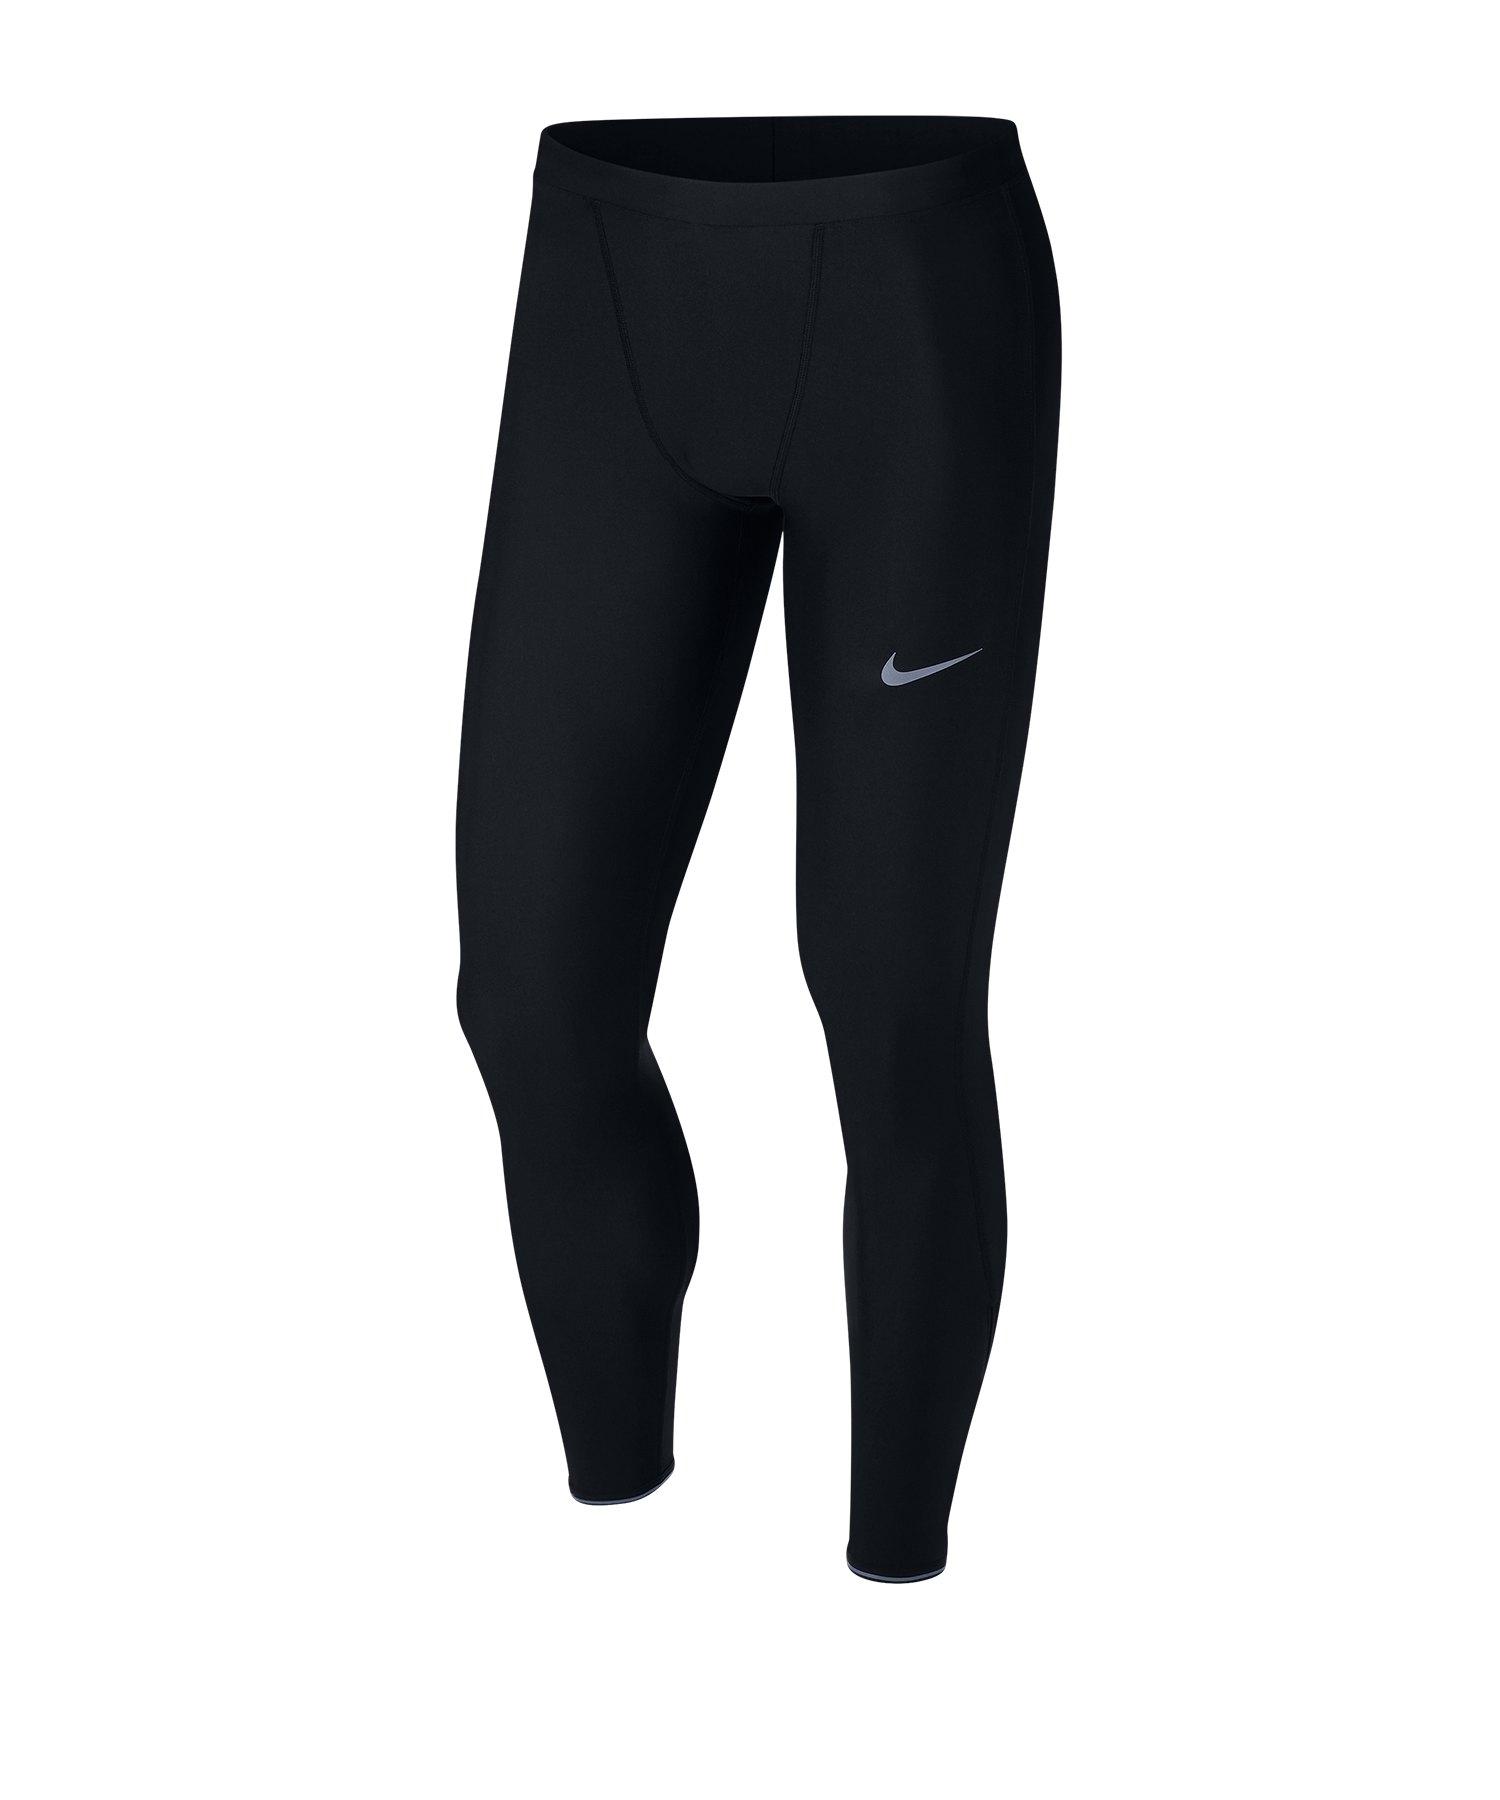 Nike Mobility Tight Running Schwarz F010 - schwarz